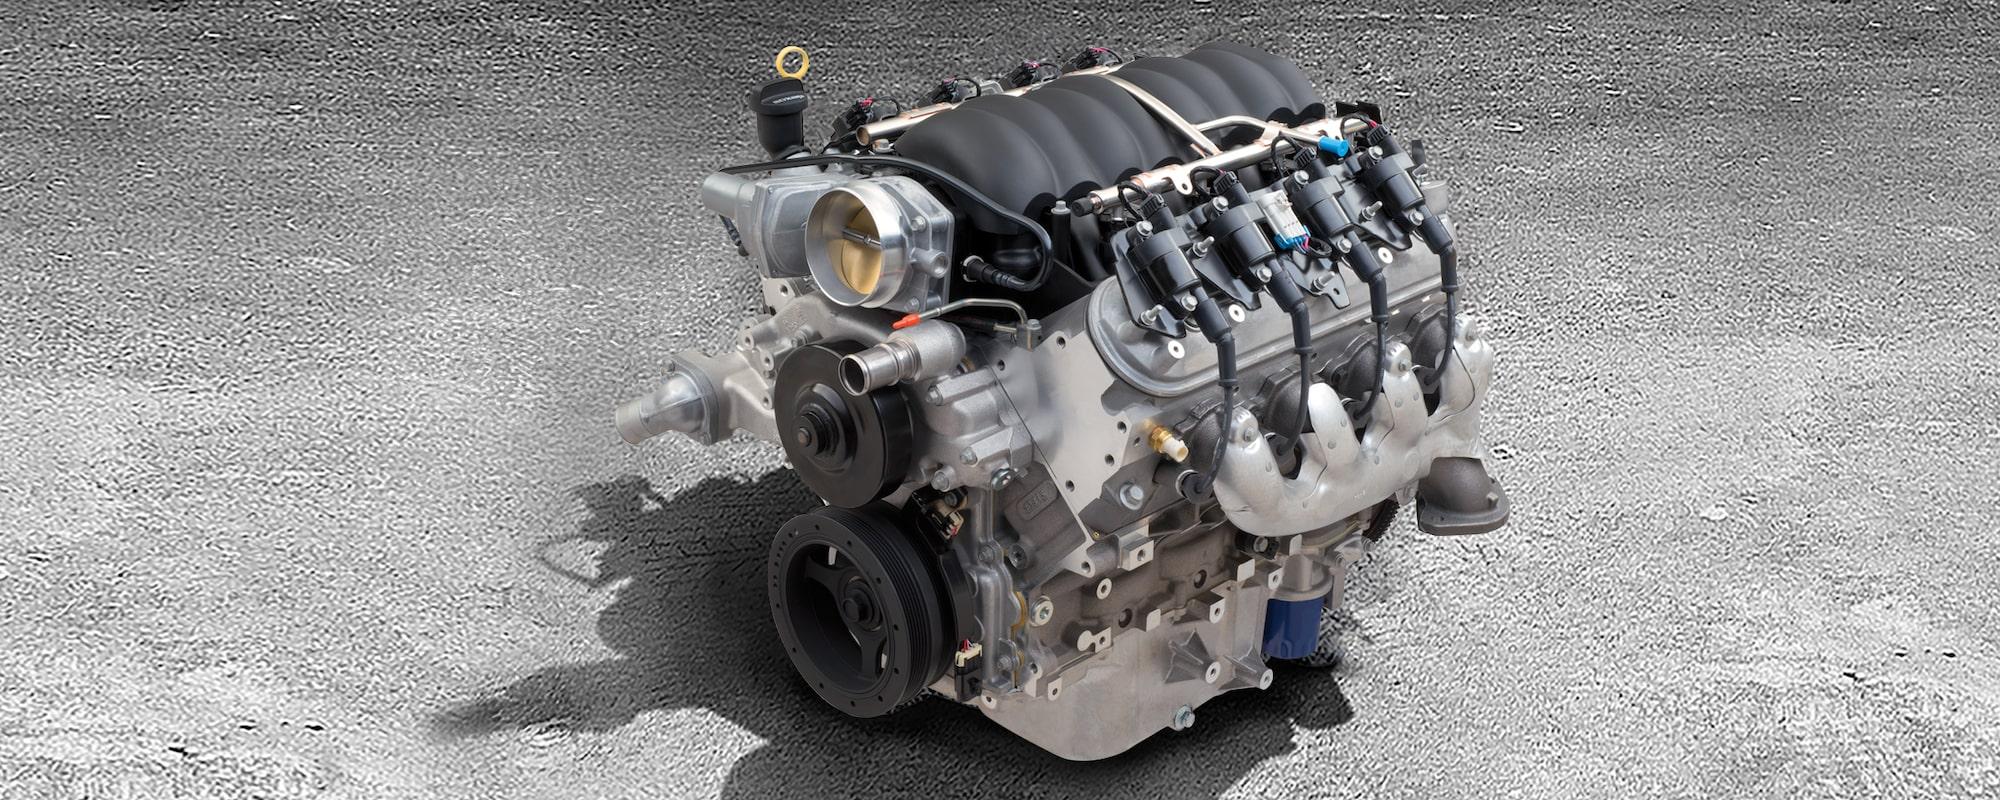 ls3 crate engine race engine chevrolet performance rh chevrolet com 350 Small Block Chevy Engine Diagram 305 Vortec Engine Diagram